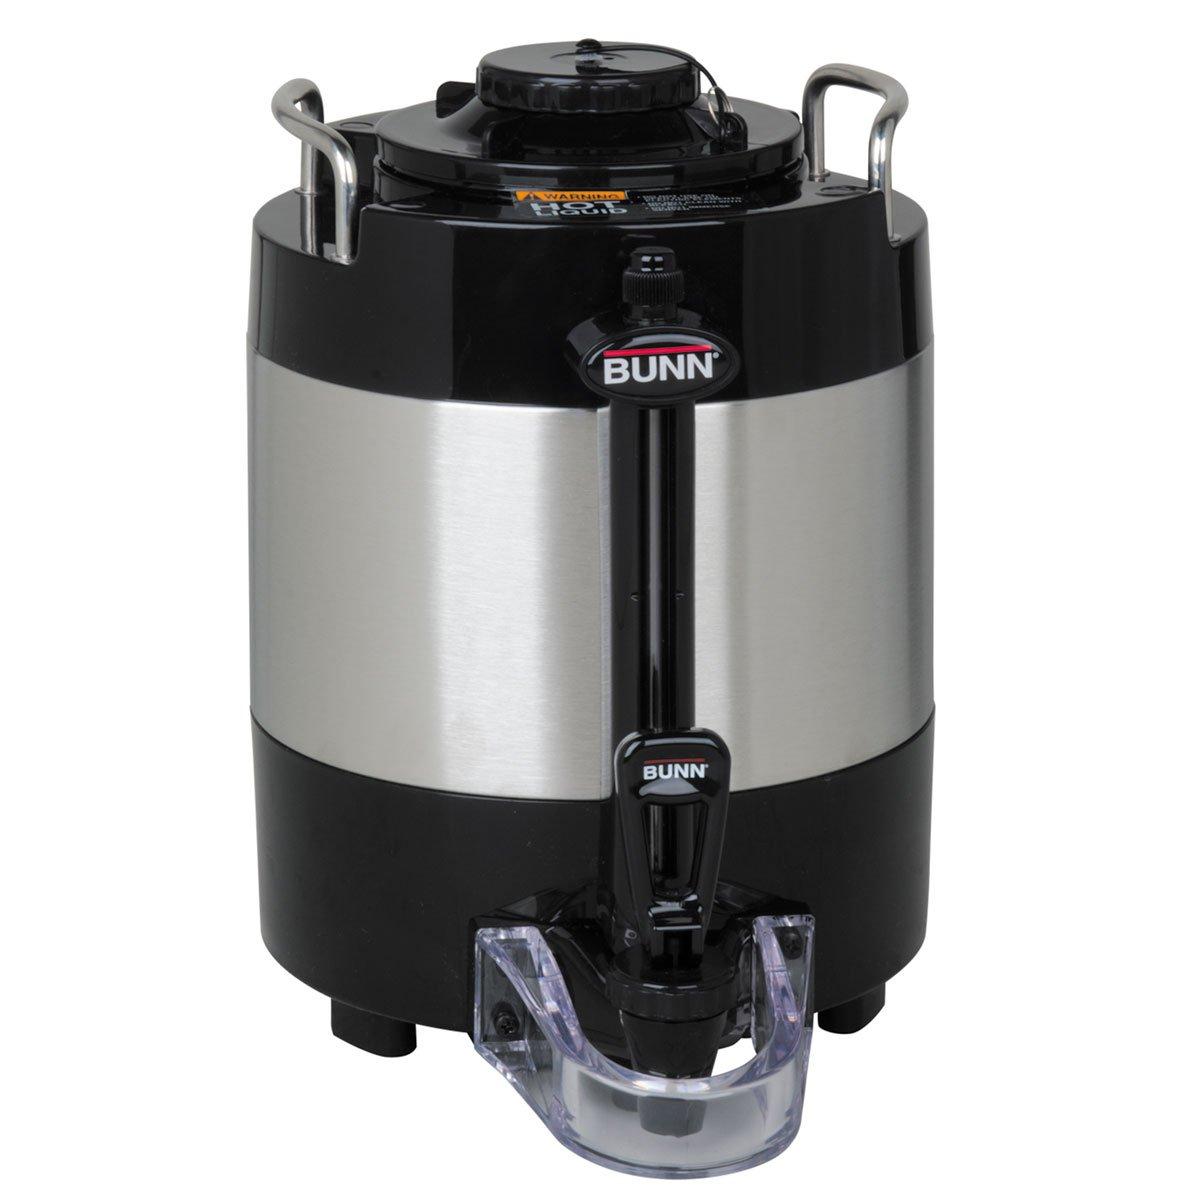 Bunn - 44000.0050 - Thermofresh 1 Gallon Stainless Steel Server